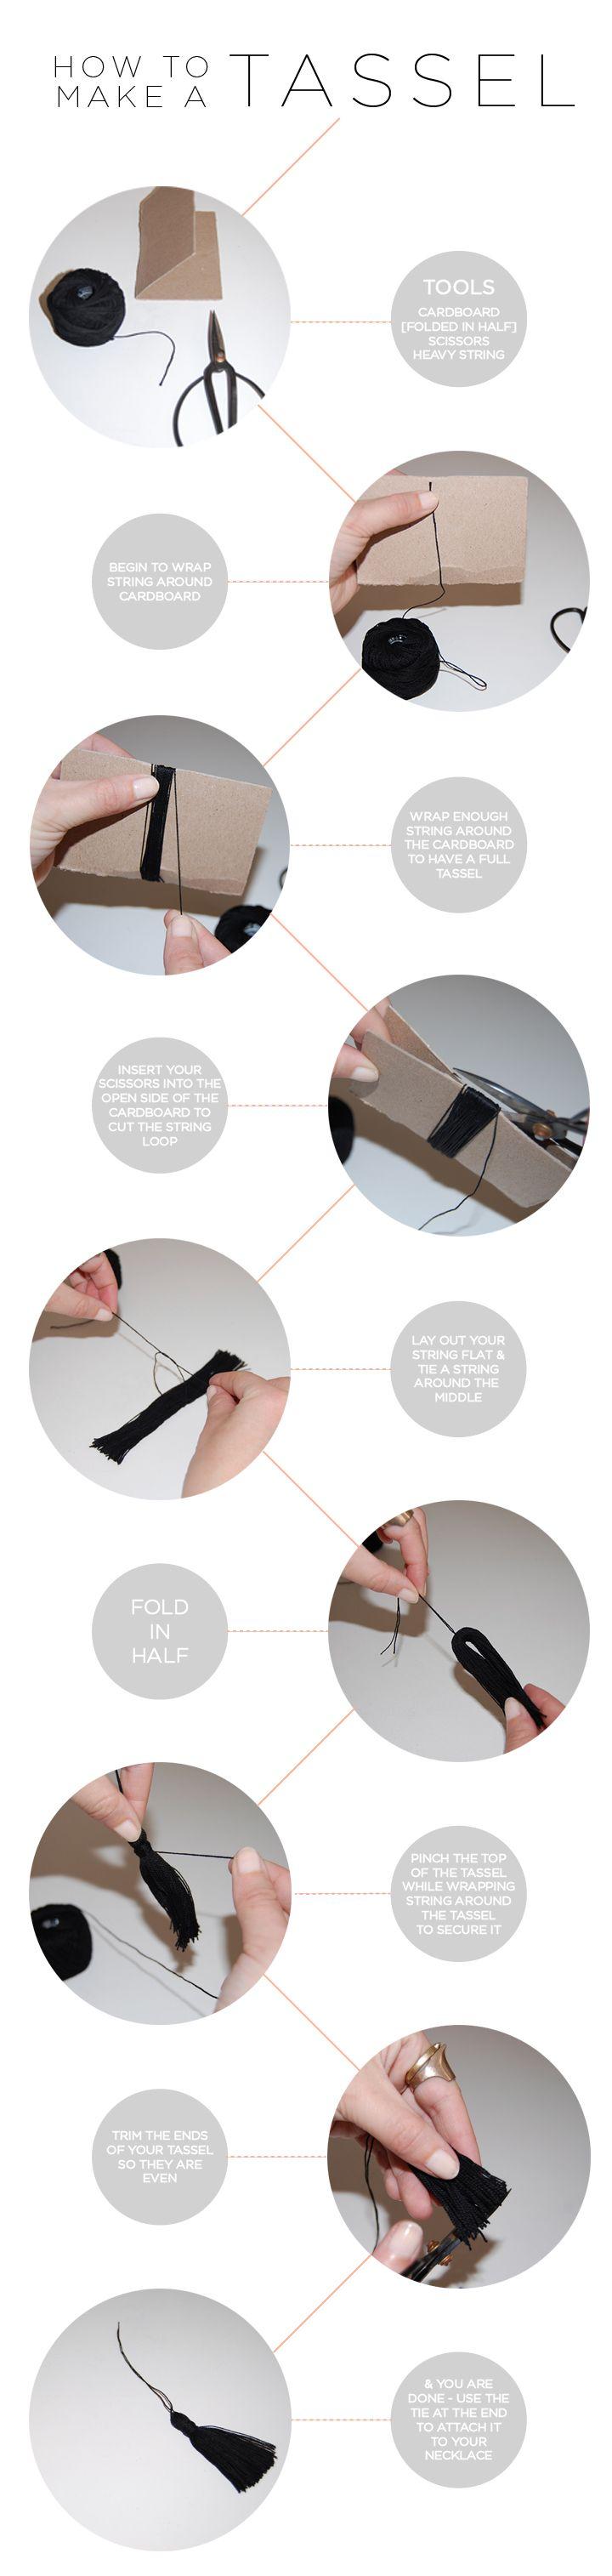 DIY How to make a Tassle.